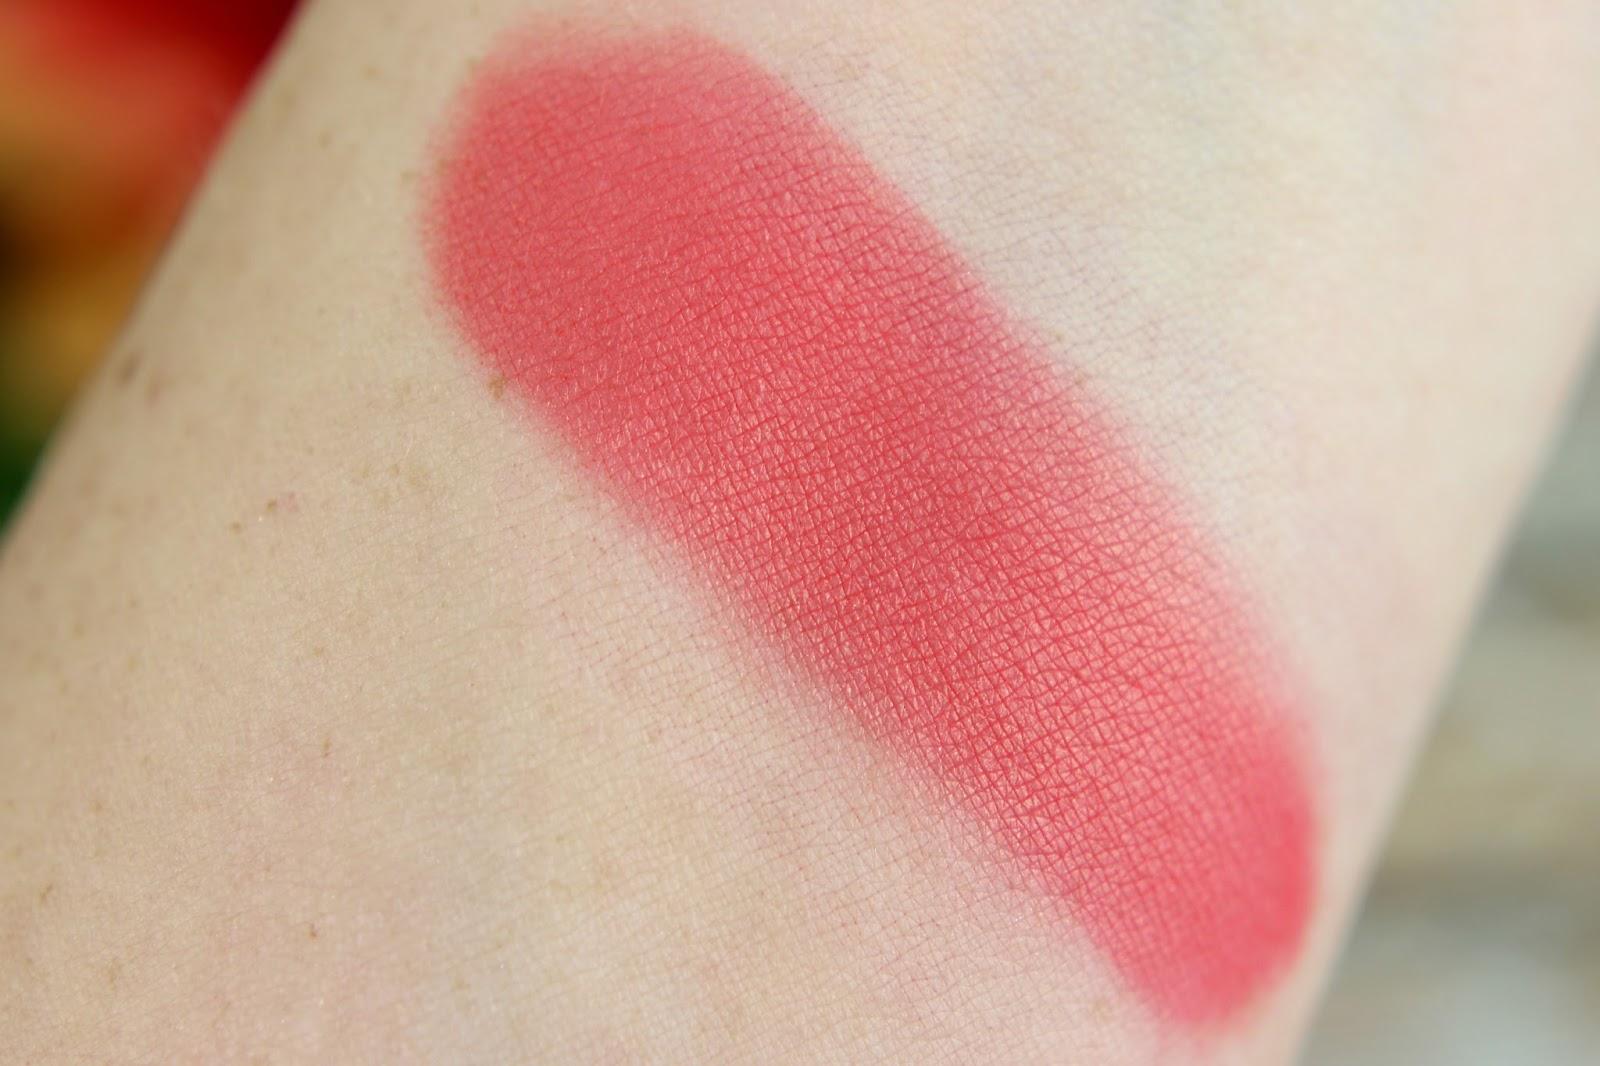 2016, augenbrauen gel, beauty, beauty mosaic blush, beauty voyage, color fusion lipstick, cosmetics, dm drogeriemarkt, drogerie, farbtrends, le, limited edition, nagellack, p2, review, swatches, tragebilder,